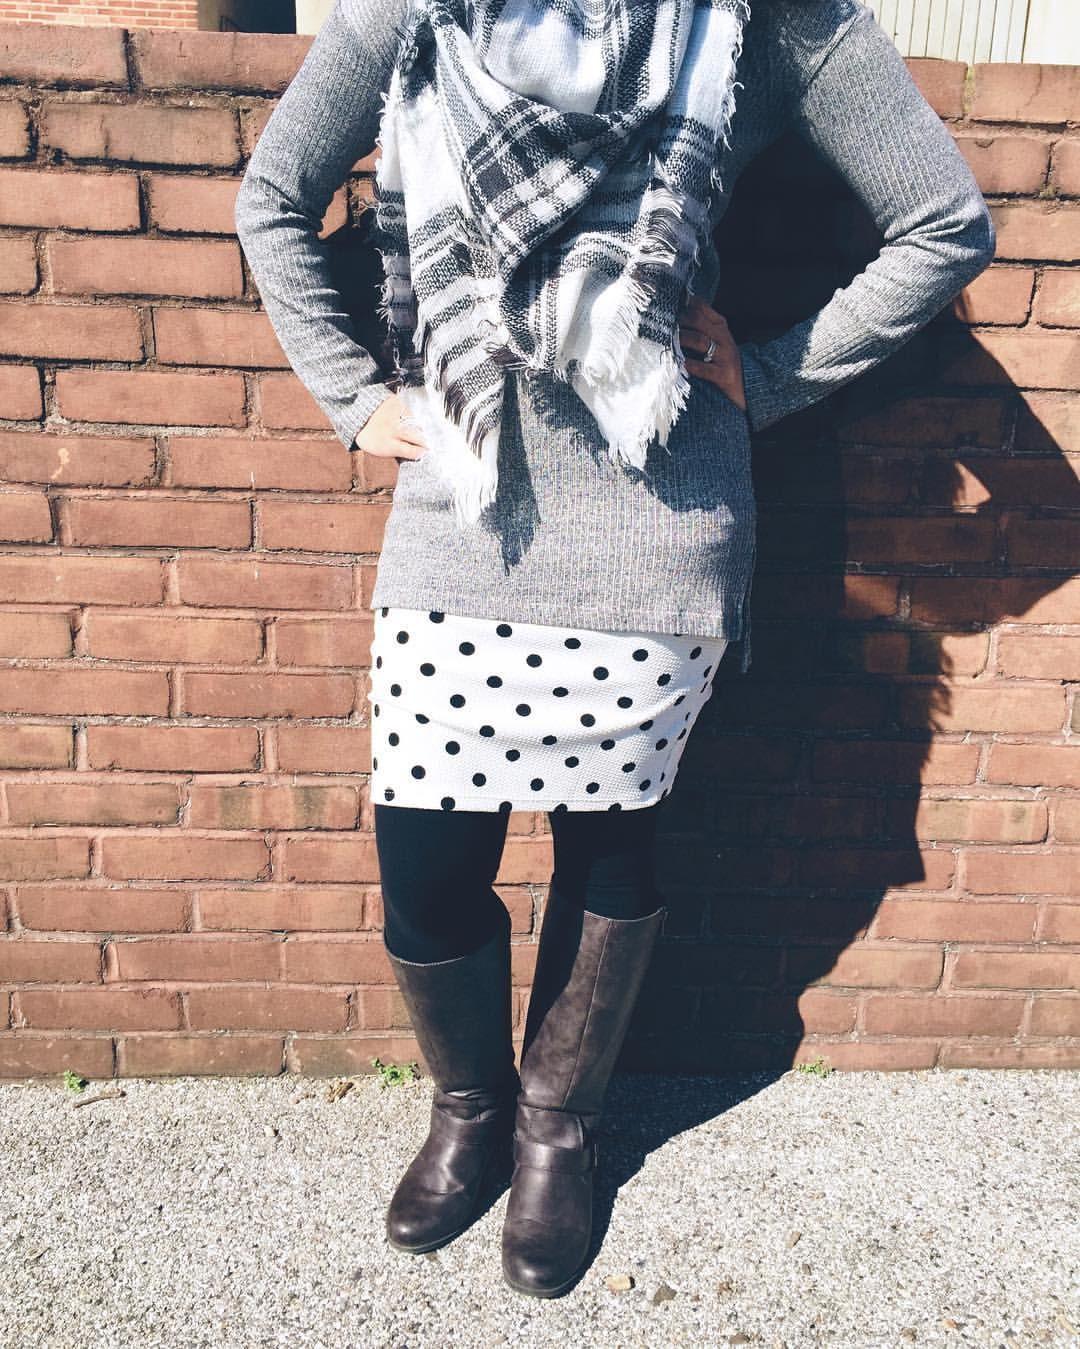 329585757c7 Outfit - LuLaRoe Cassie, Grey Sweater, Chunky Scarf, Black Leggings ...